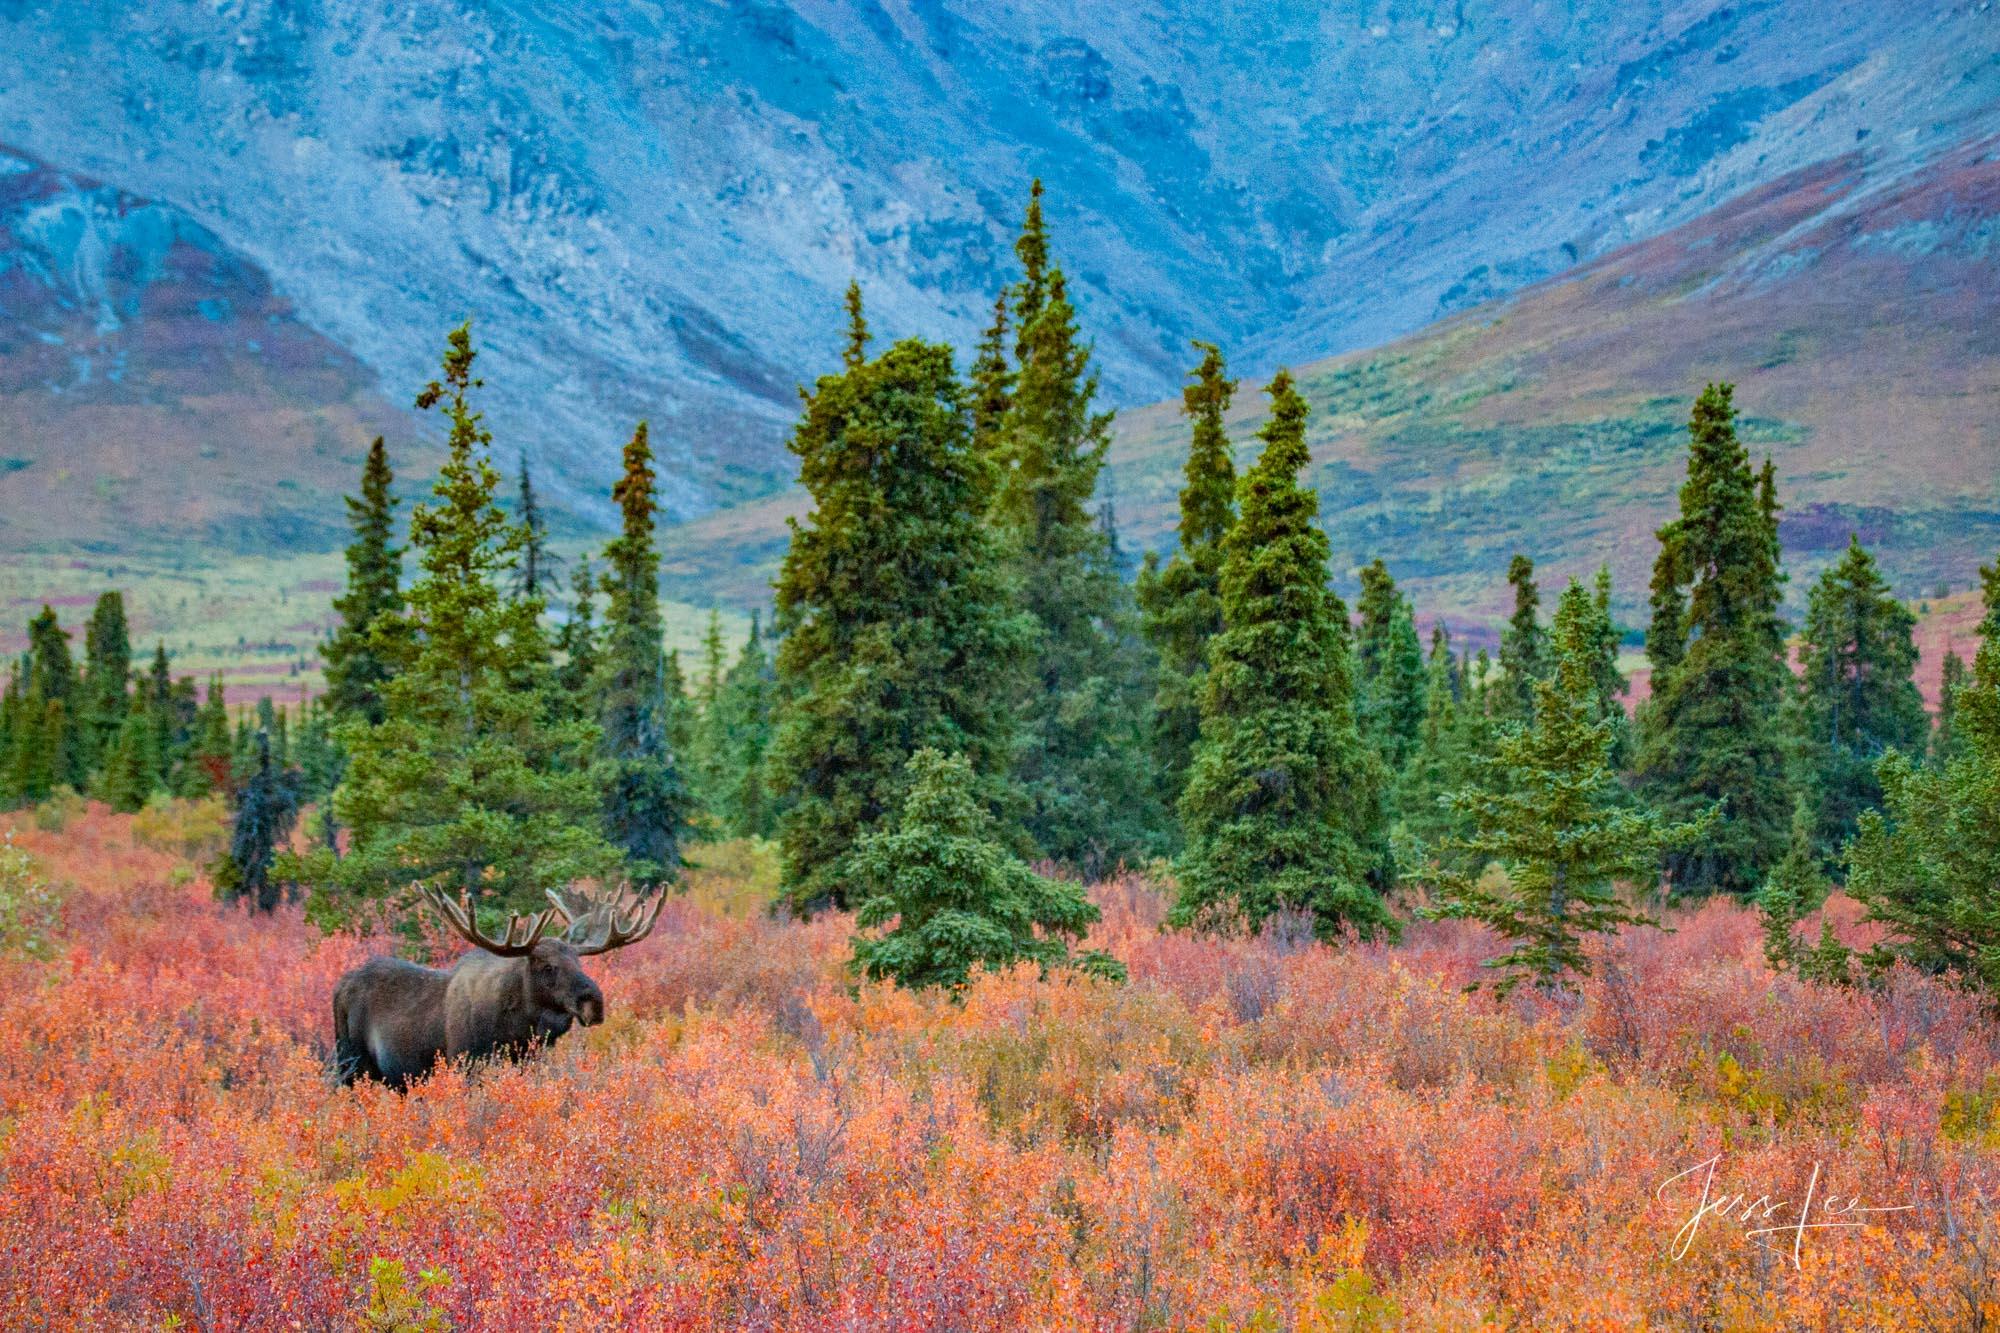 Alaska, high quality, prints, landscape, wolf, moose, , print, fine art, mammals, photograph, photo, wilderness, photo